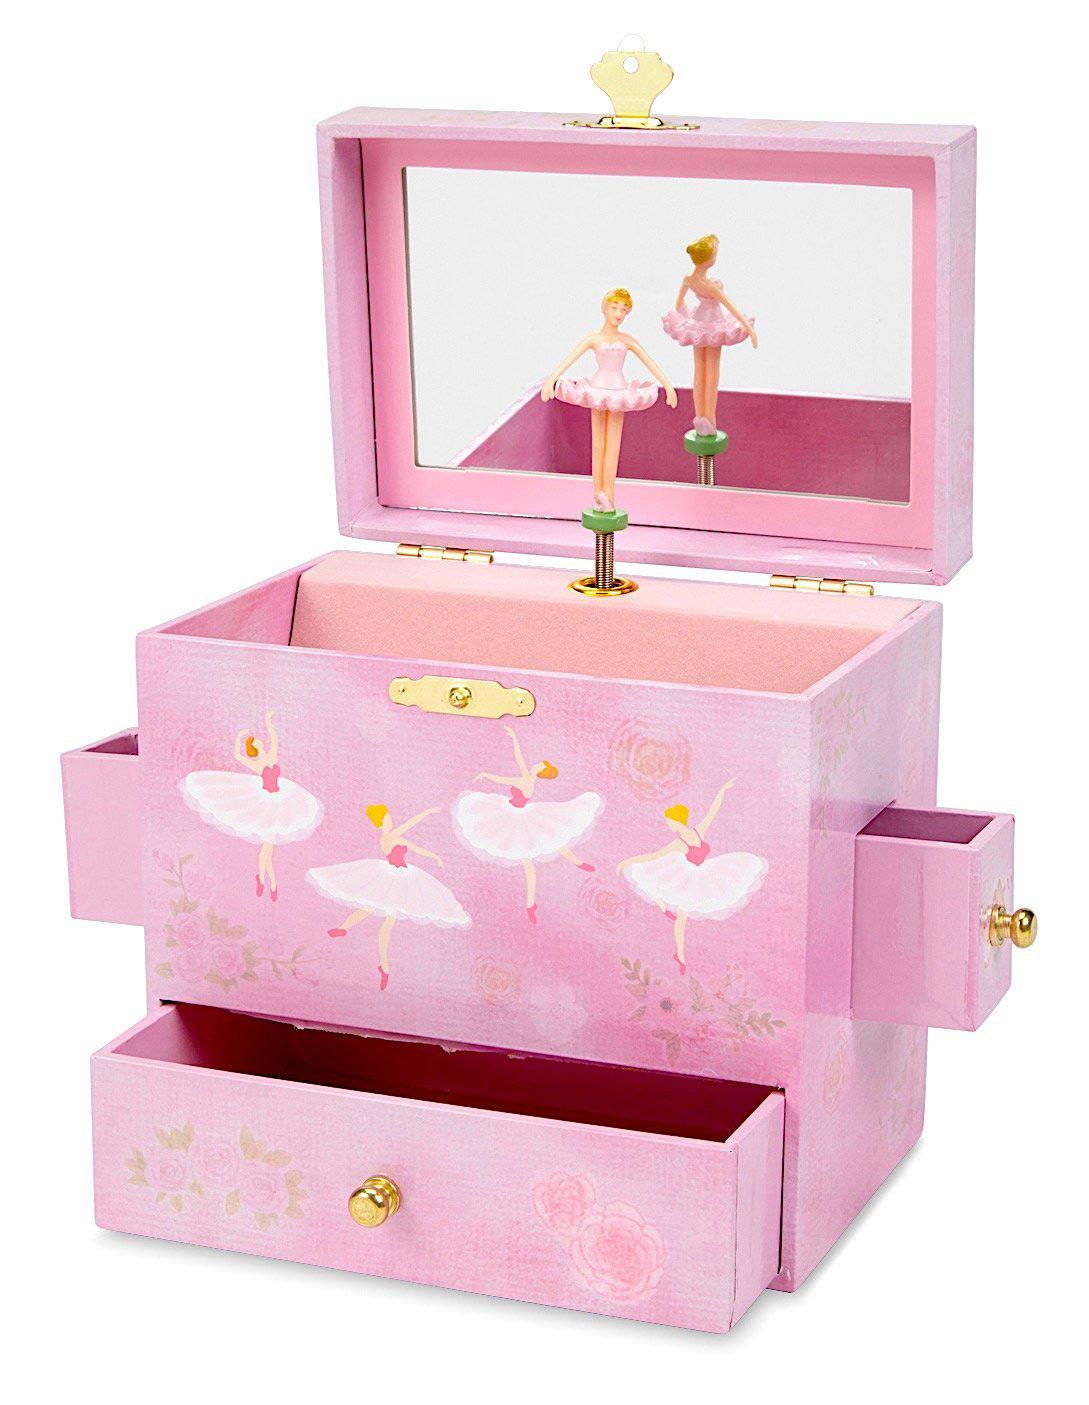 Pink Ballerina Themed Countertop Children